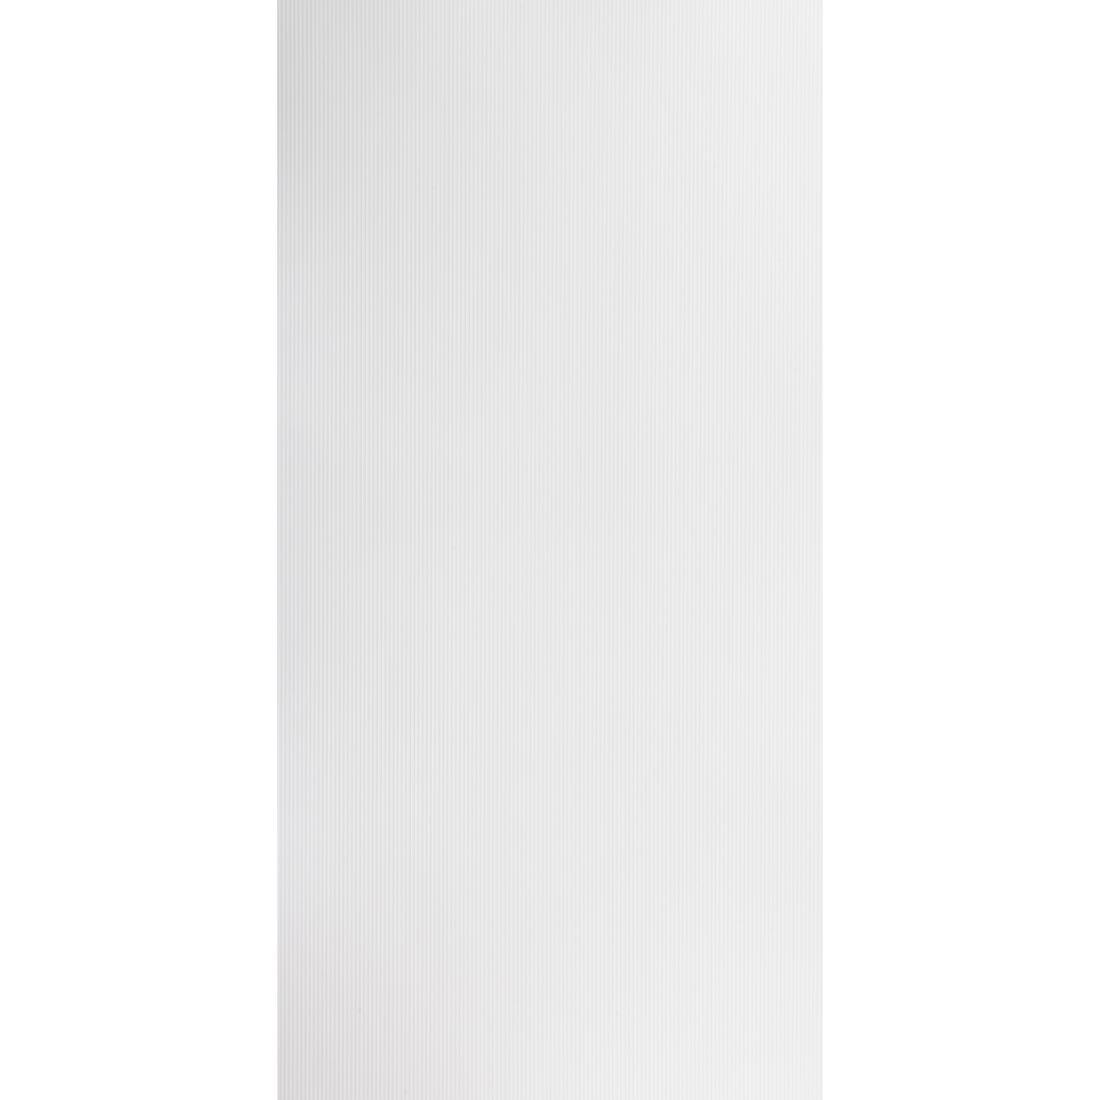 Aqua Wall Lining Panel Polar White Ripple 2400 x 1200 x 4.5mm